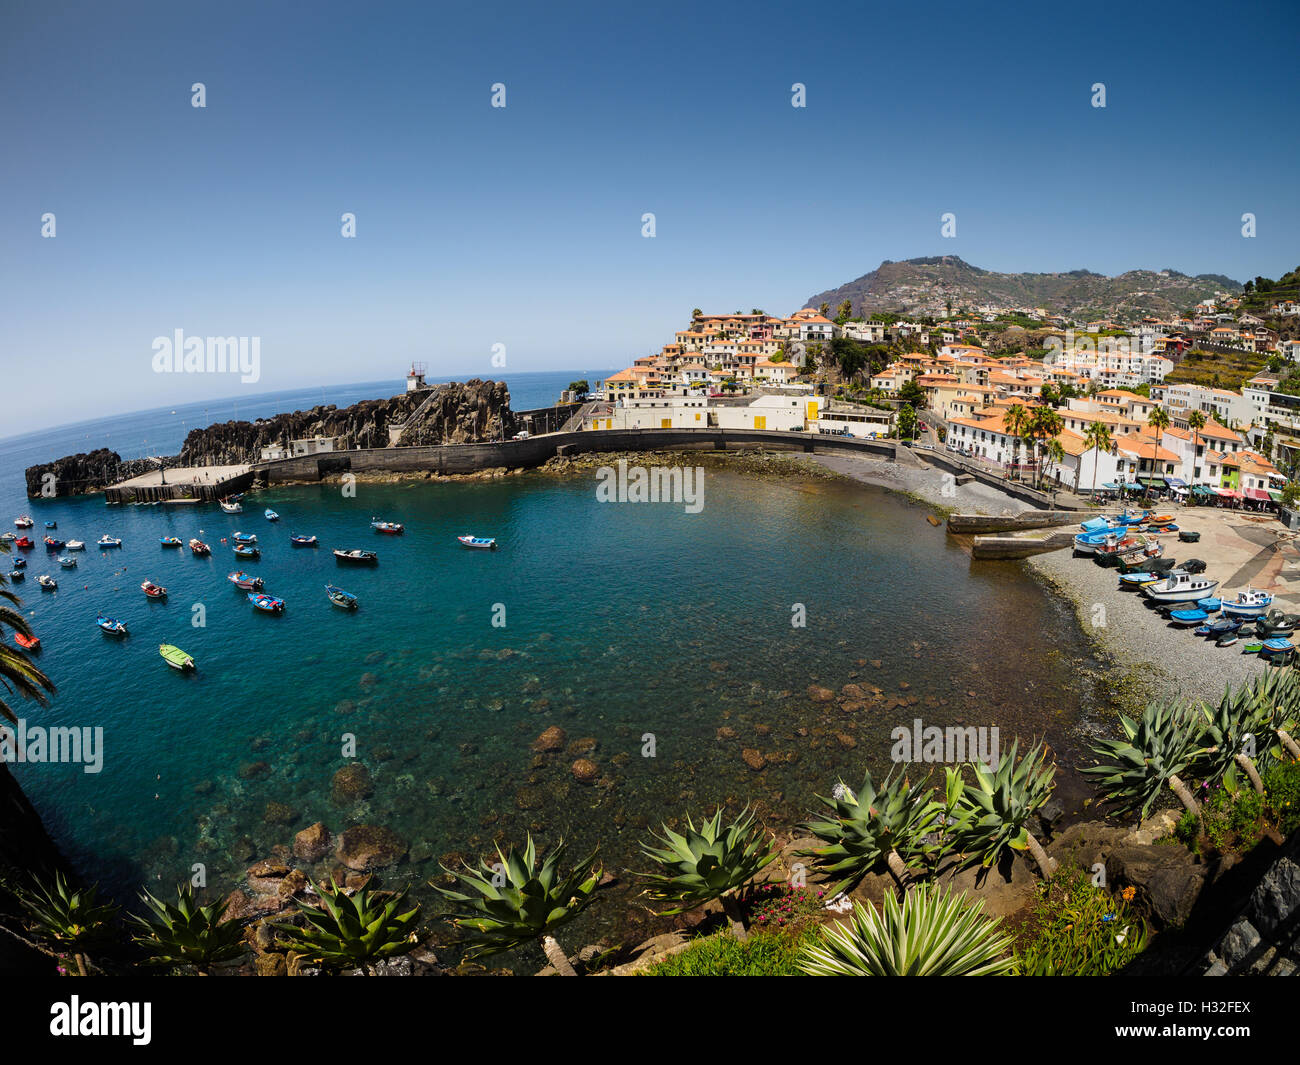 A view over the bay of Camara de Lobos on the Portuguese island of Madeira - Stock Image